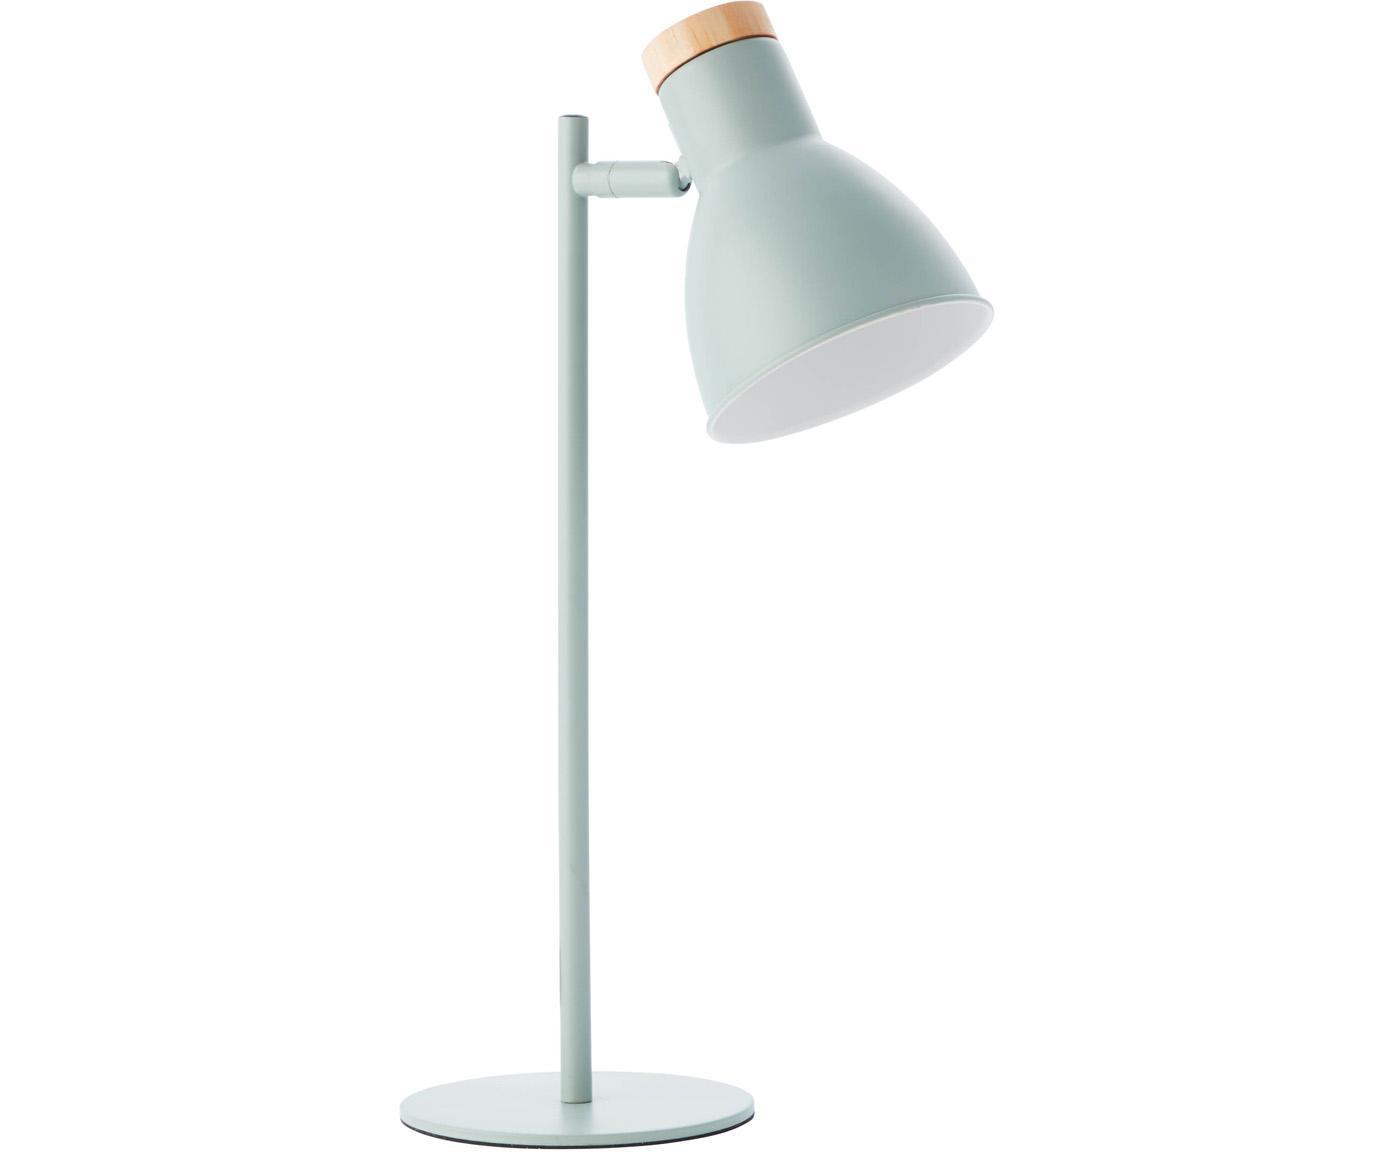 Schreibtischlampe Venea mit Holz-Dekor, Lampenschirm: Metall, Lampenfuß: Metall, Dekor: Holz, Mintgrün, Holz, Ø 15 x H 47 cm